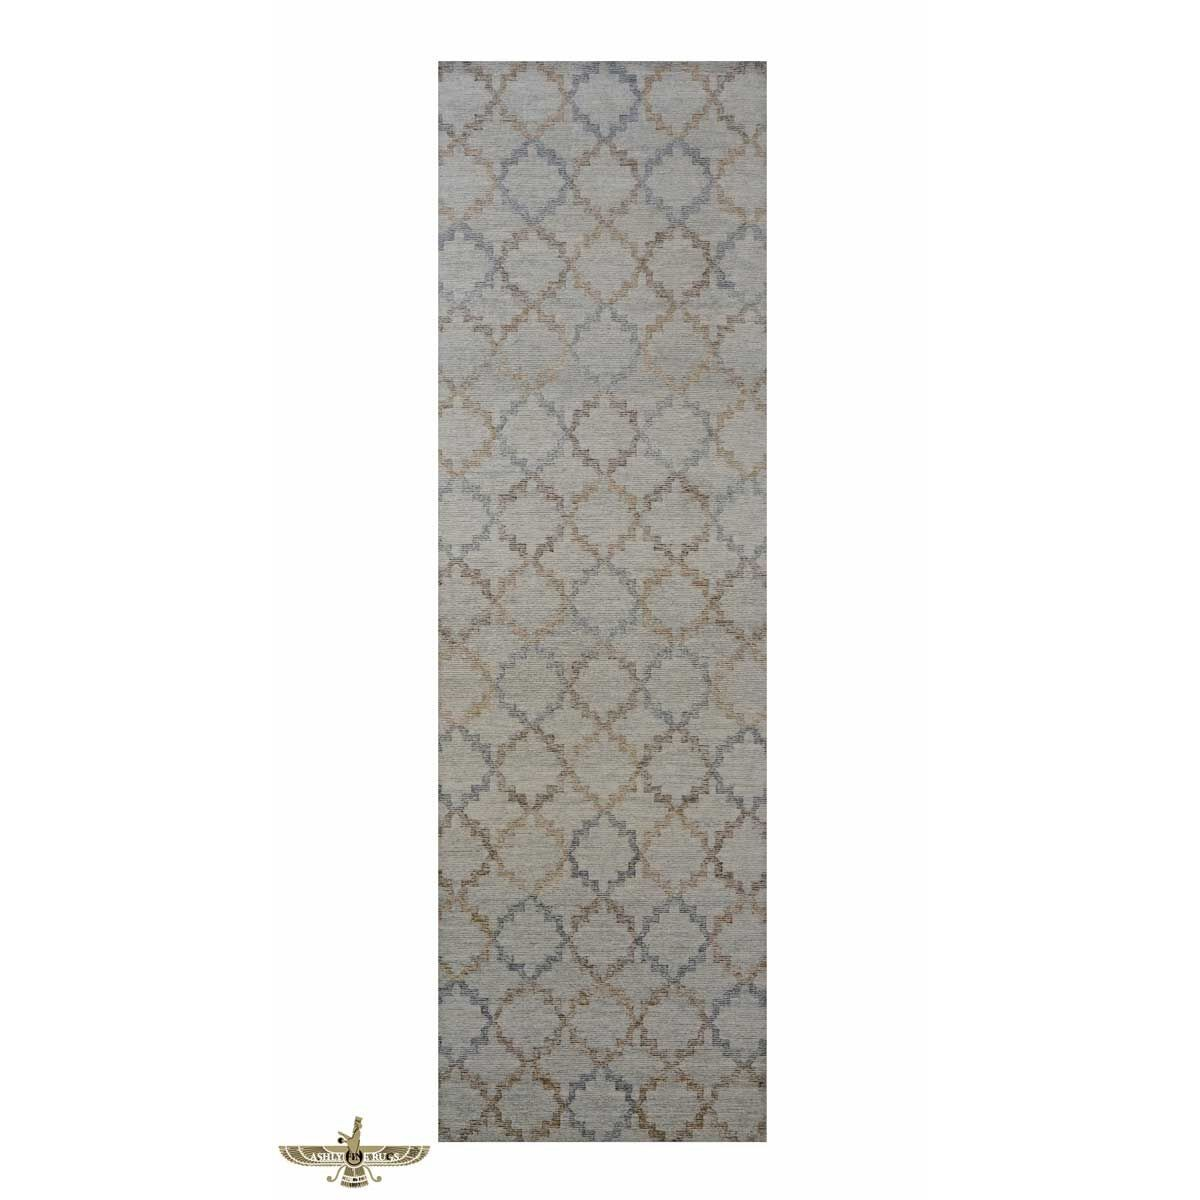 Area Rugs 1143852 Modern Wool And Silk 4 X 13 Indo Nepal Blue Gallery Hallway Rug